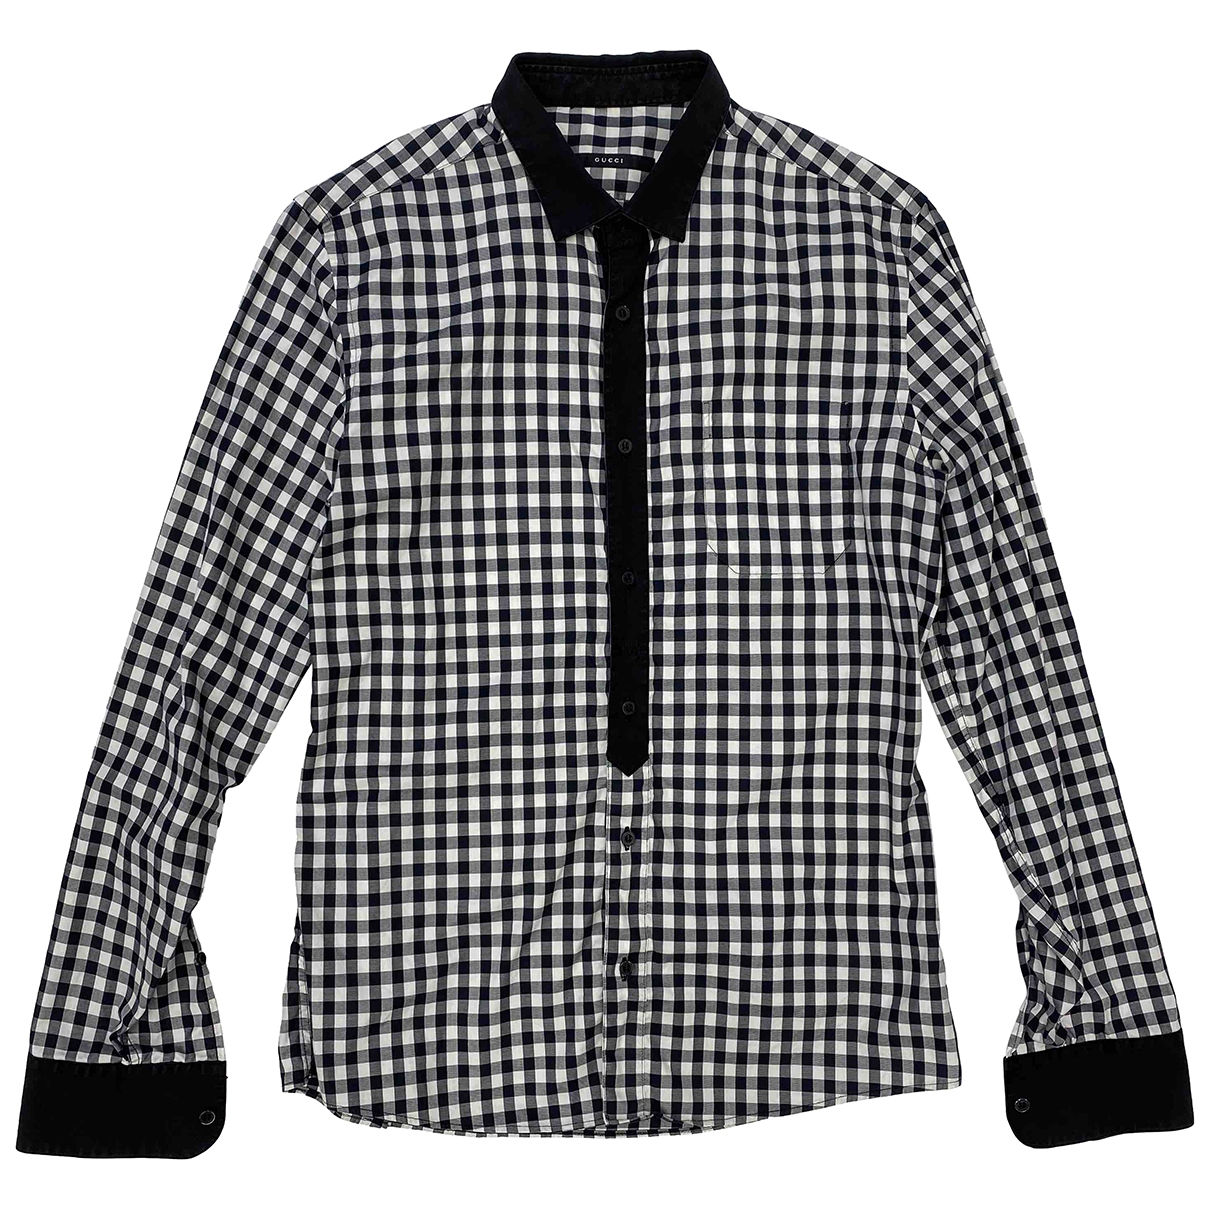 Gucci \N Black Cotton Shirts for Men 40 EU (tour de cou / collar)